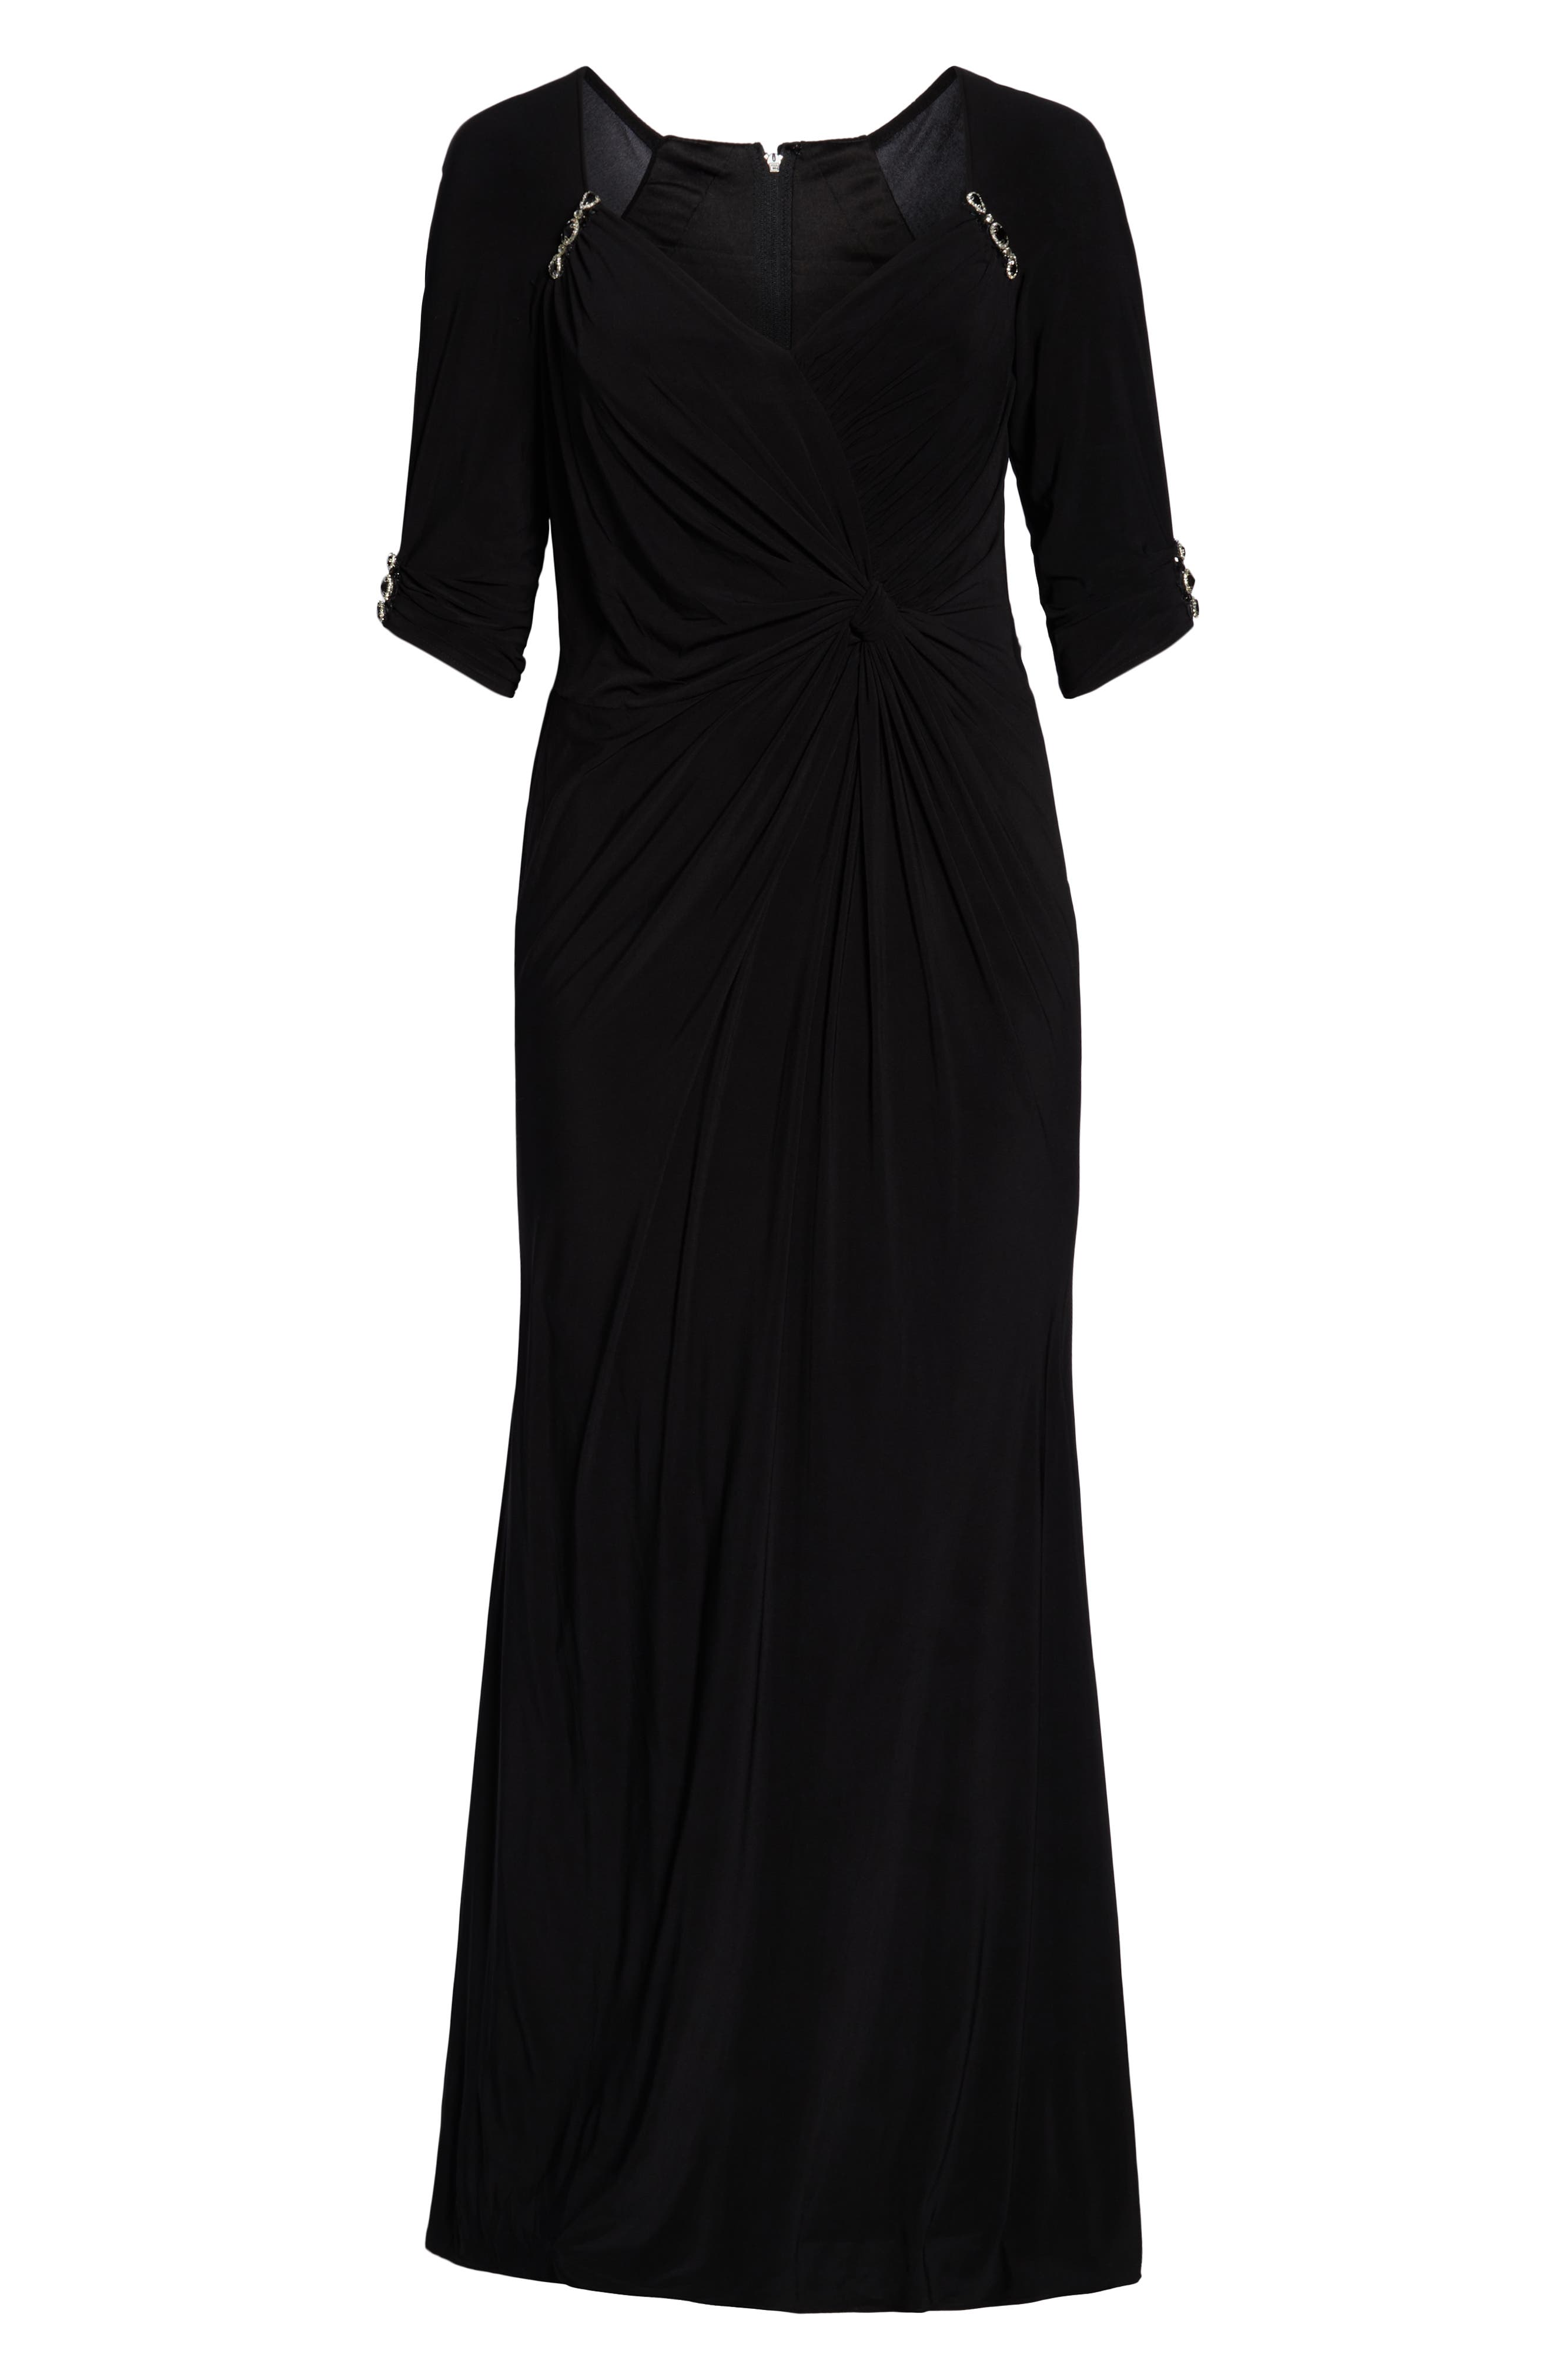 MAC DUGGAL, Crystal Embellished Twist Front Evening Dress, Alternate thumbnail 7, color, BLACK